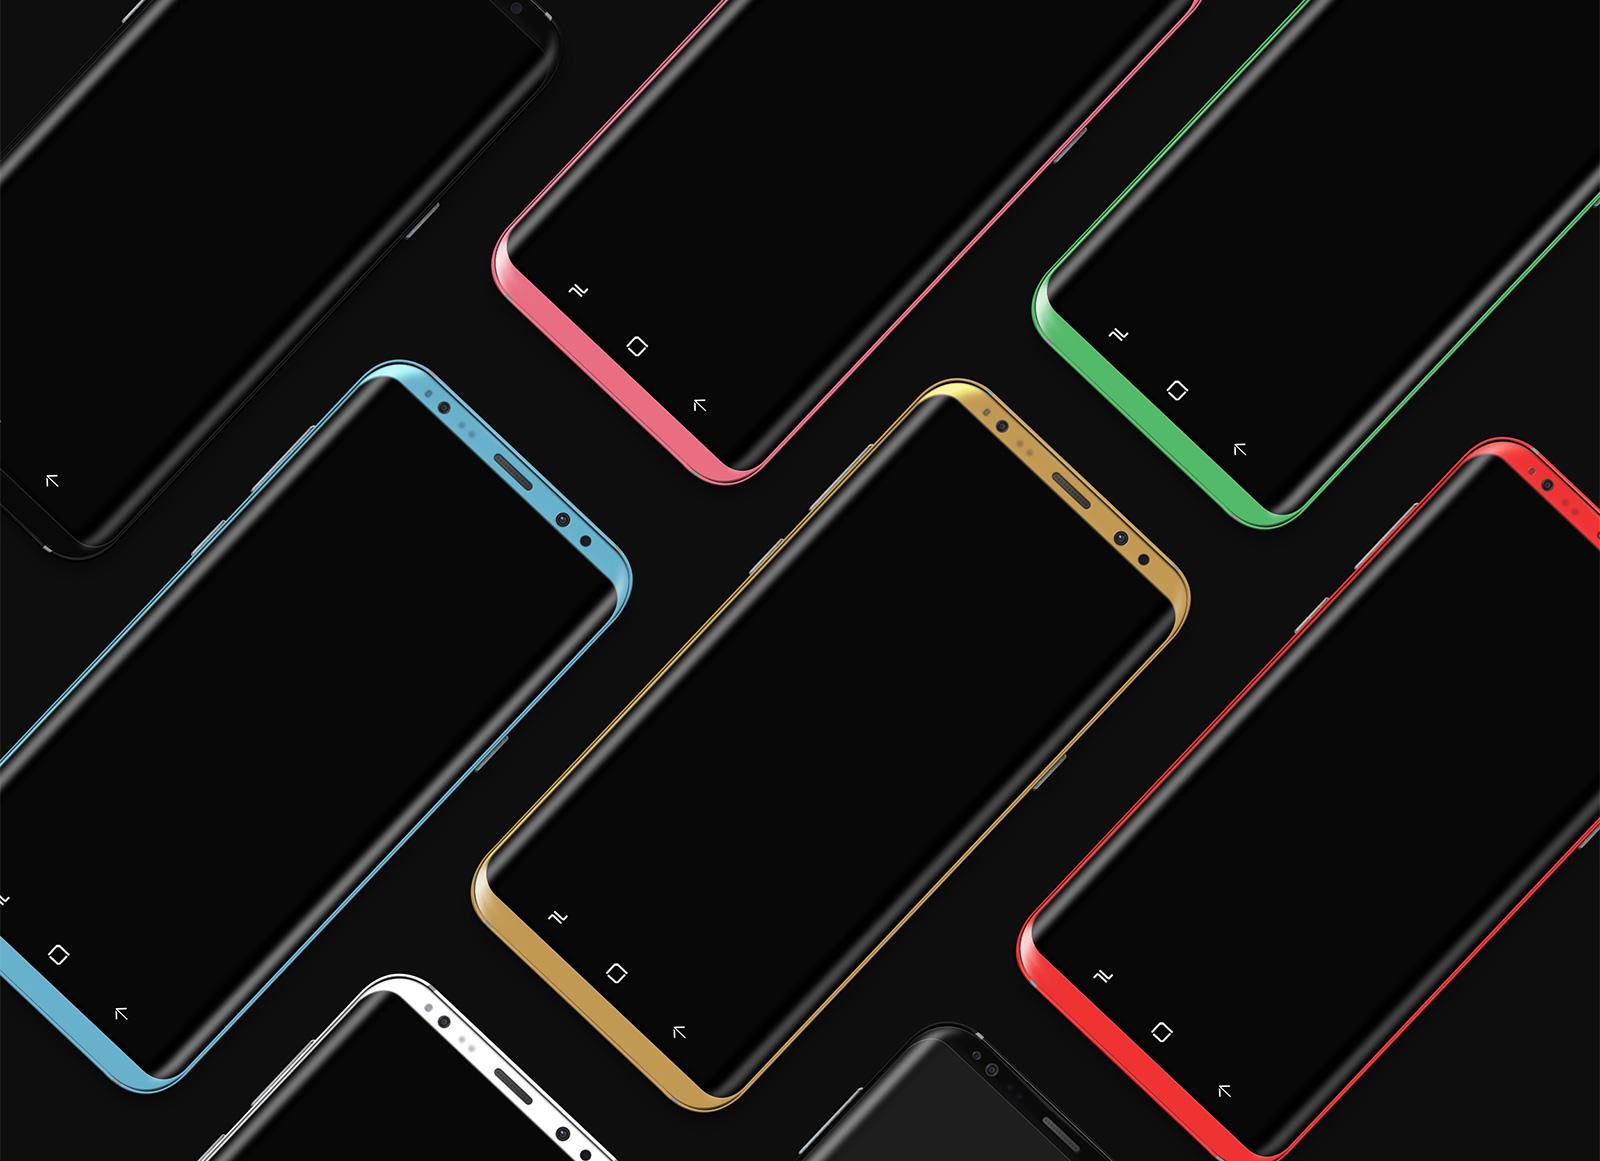 Free-Layered-Samsung-Galaxy-S8-Smartphone-Mockup-PSD-2